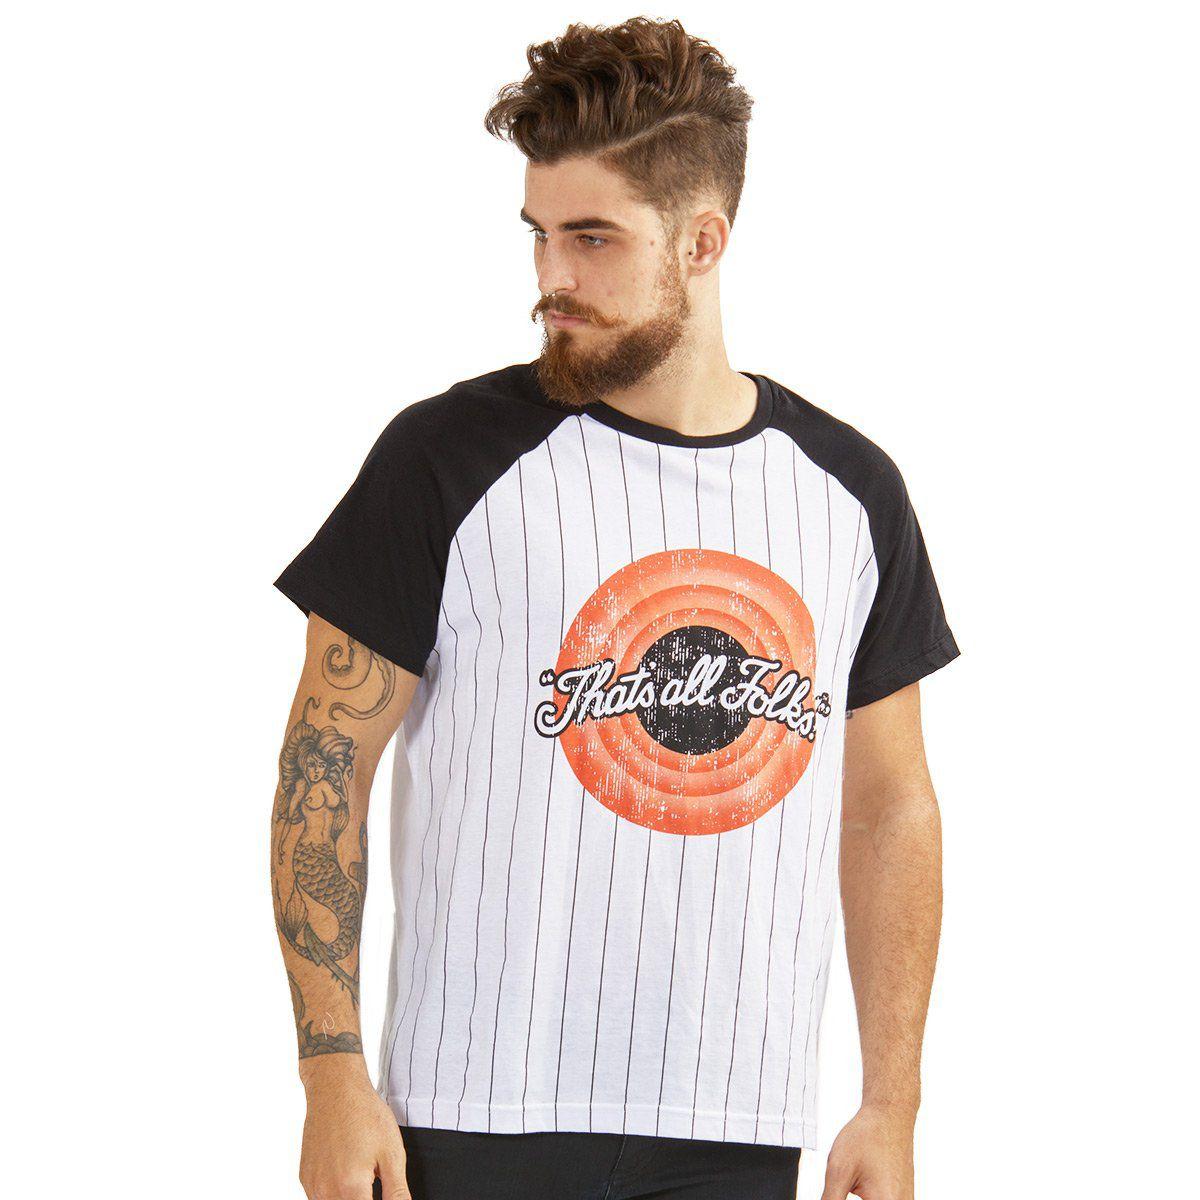 Camiseta Unissex Looney Tunes That´s All Folks  - bandUP Store Marketplace